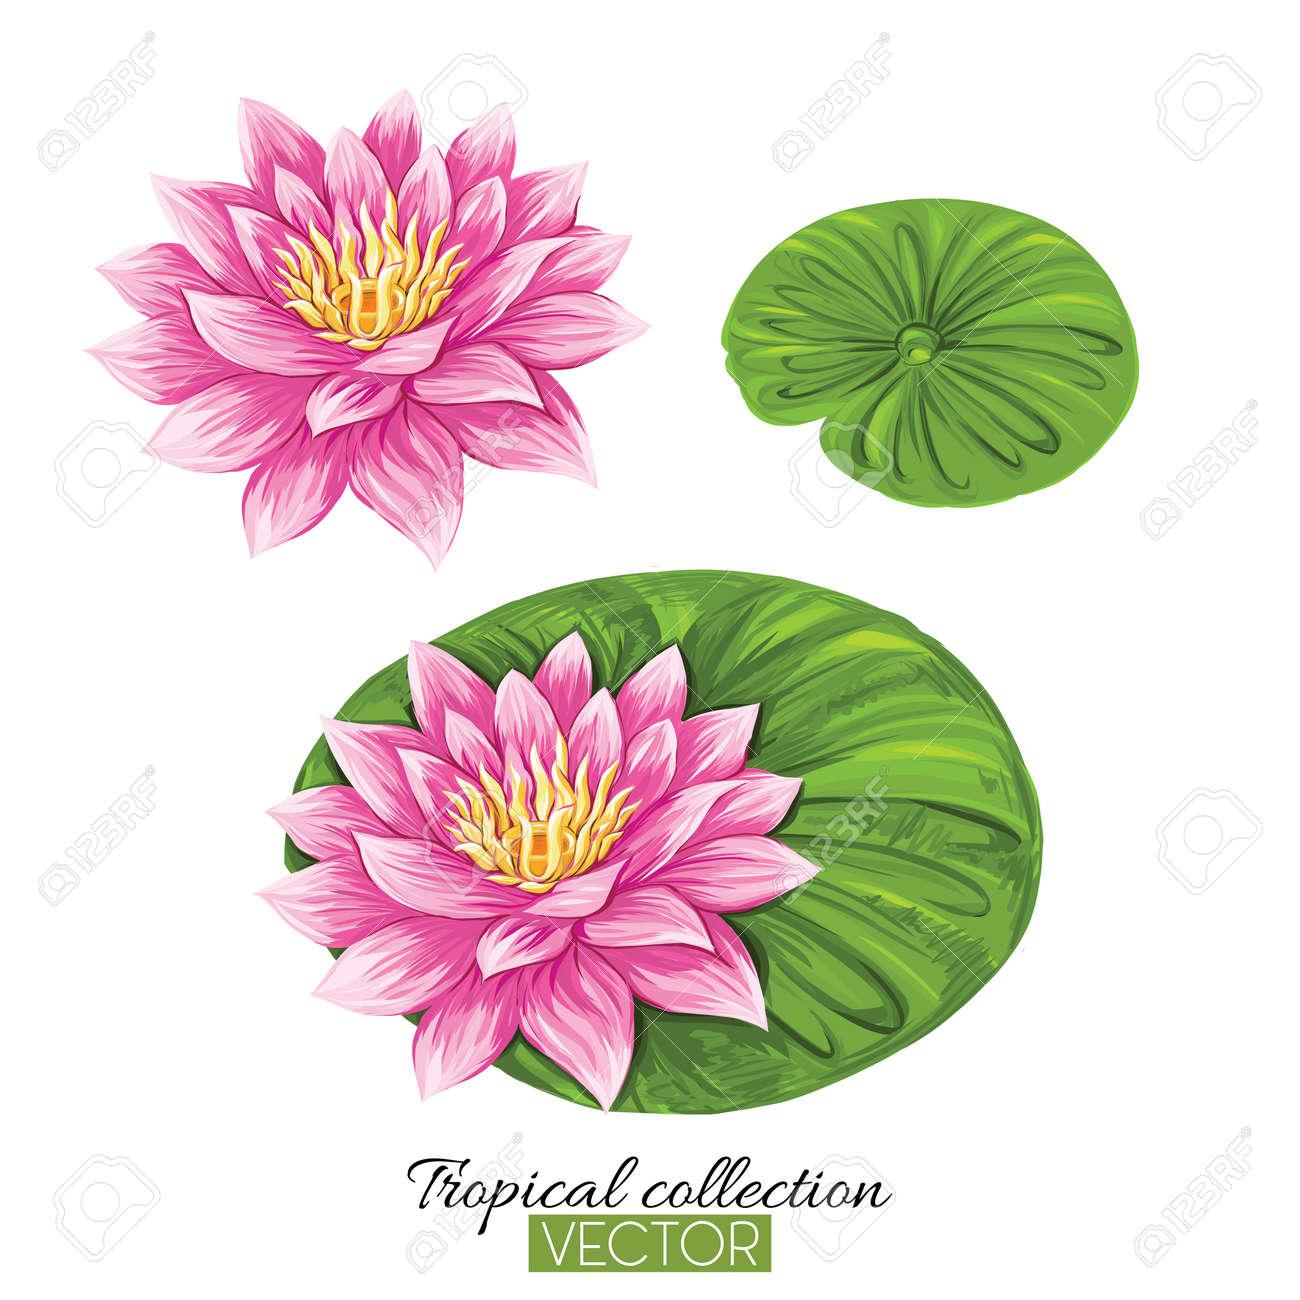 Beautiful hand drawn botanical vector illustration with lotus fl - 106918401